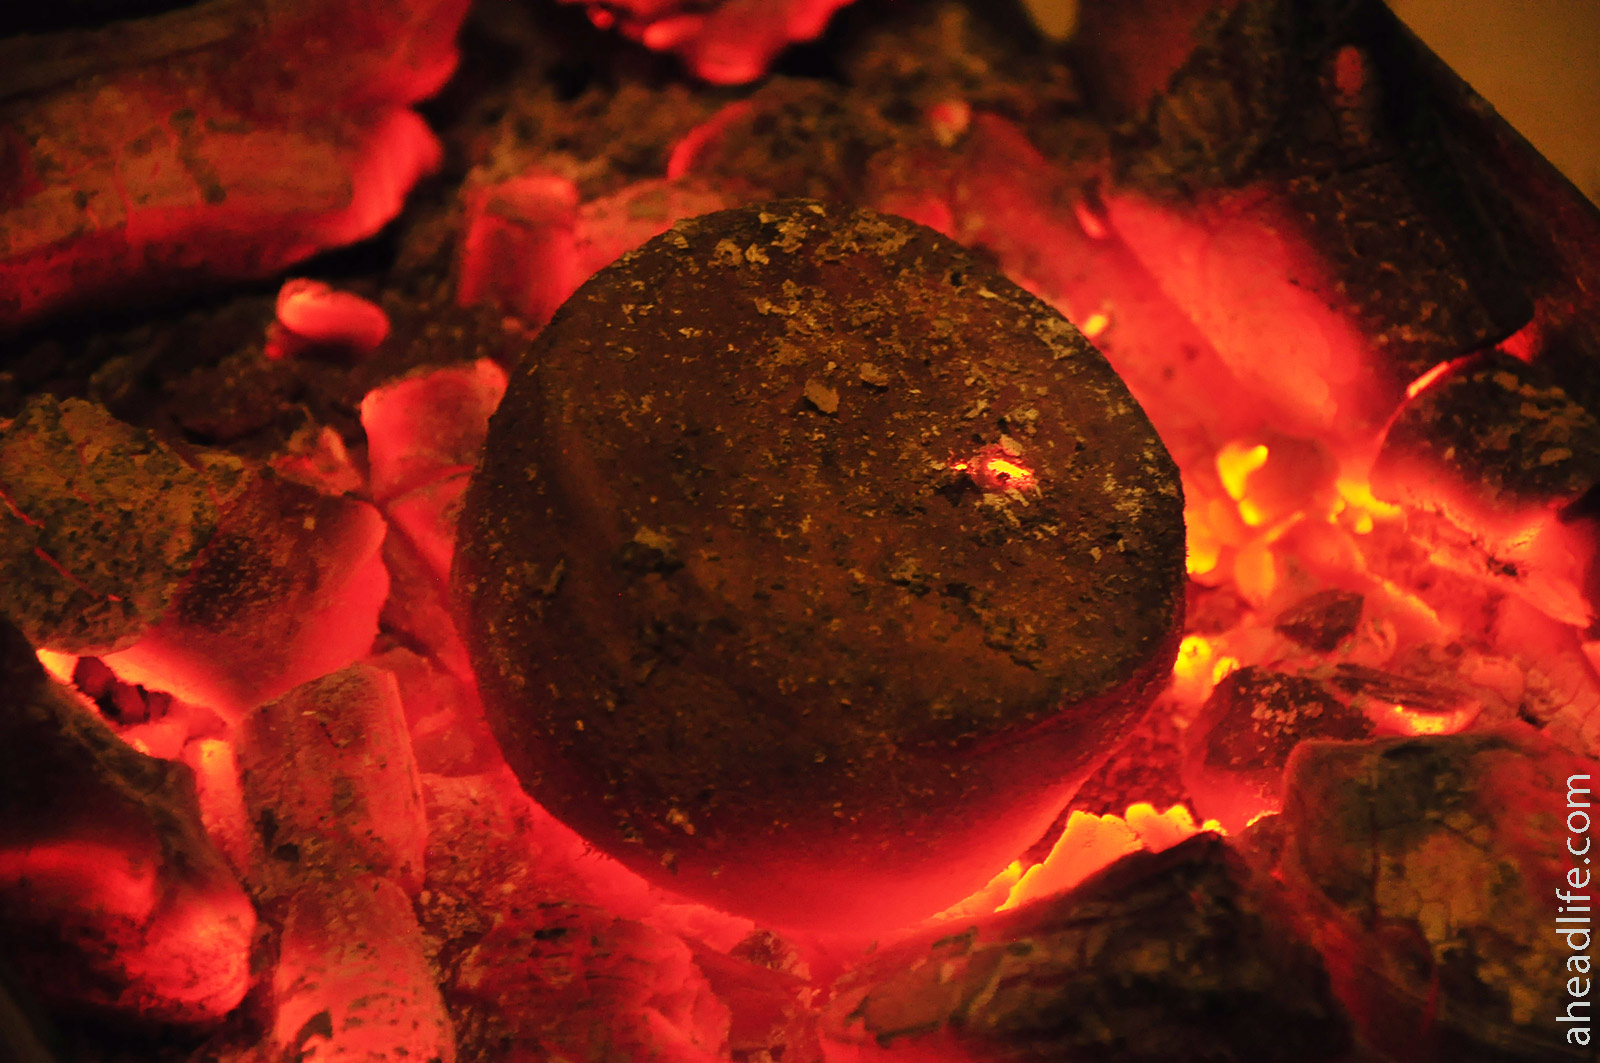 Обжиг глины в мангале